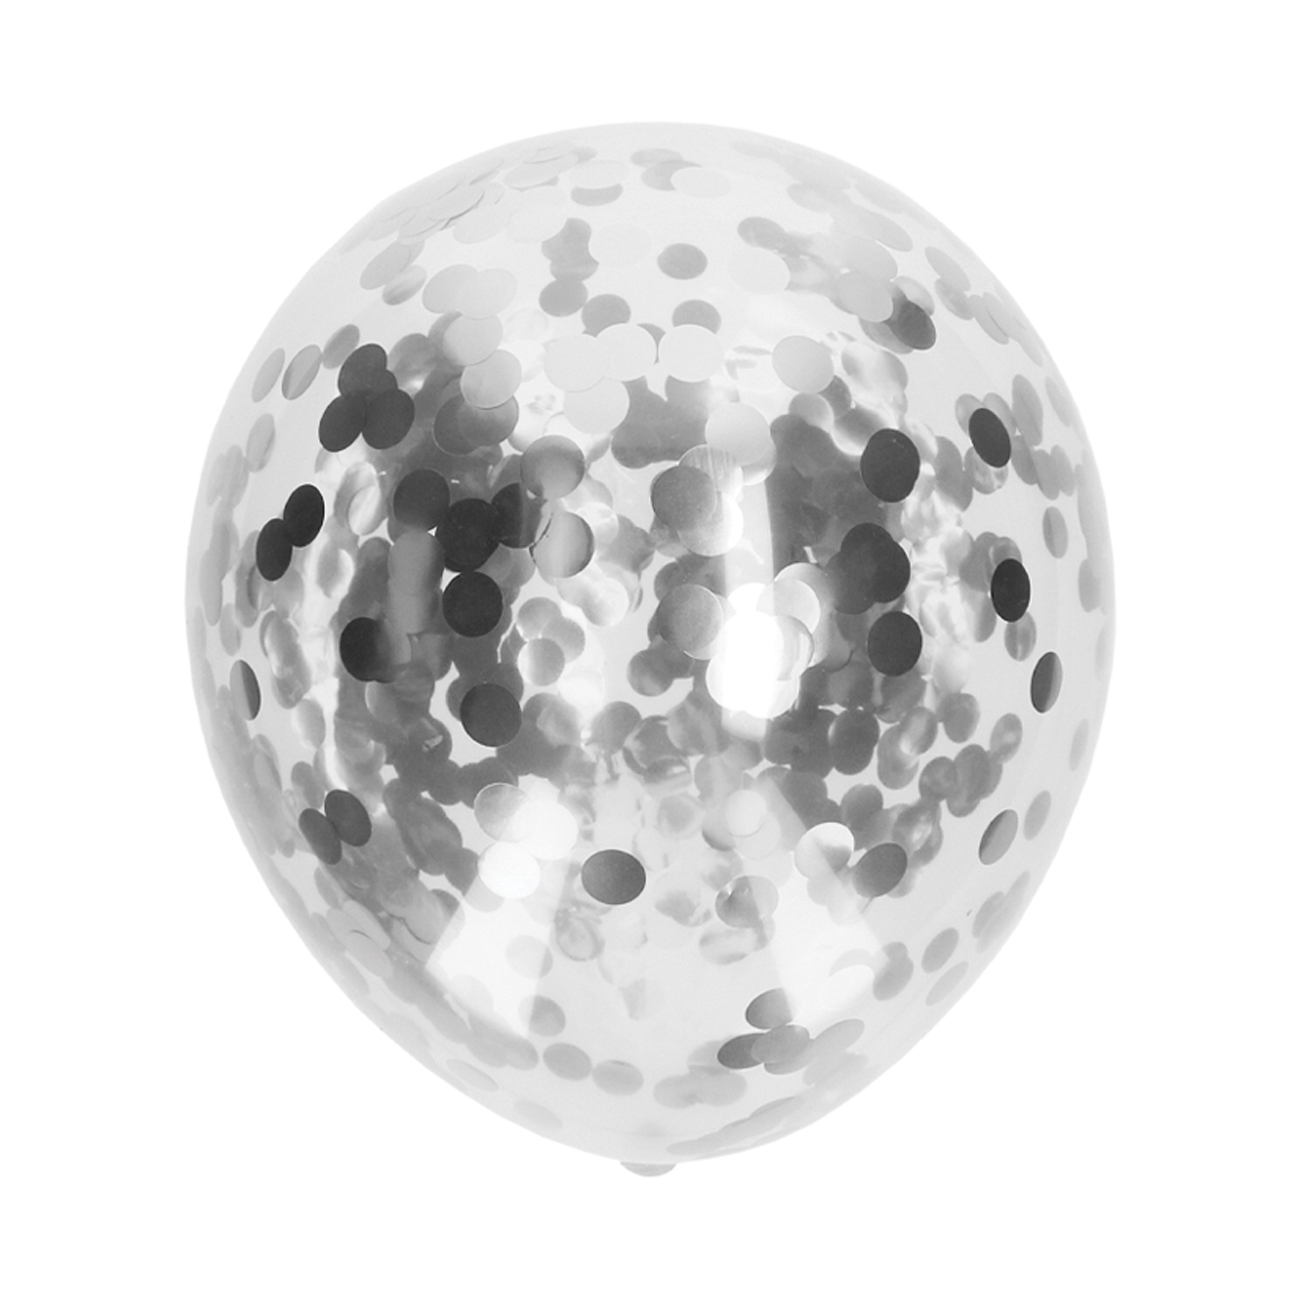 Ballonnen confetti zilver 5 stuks